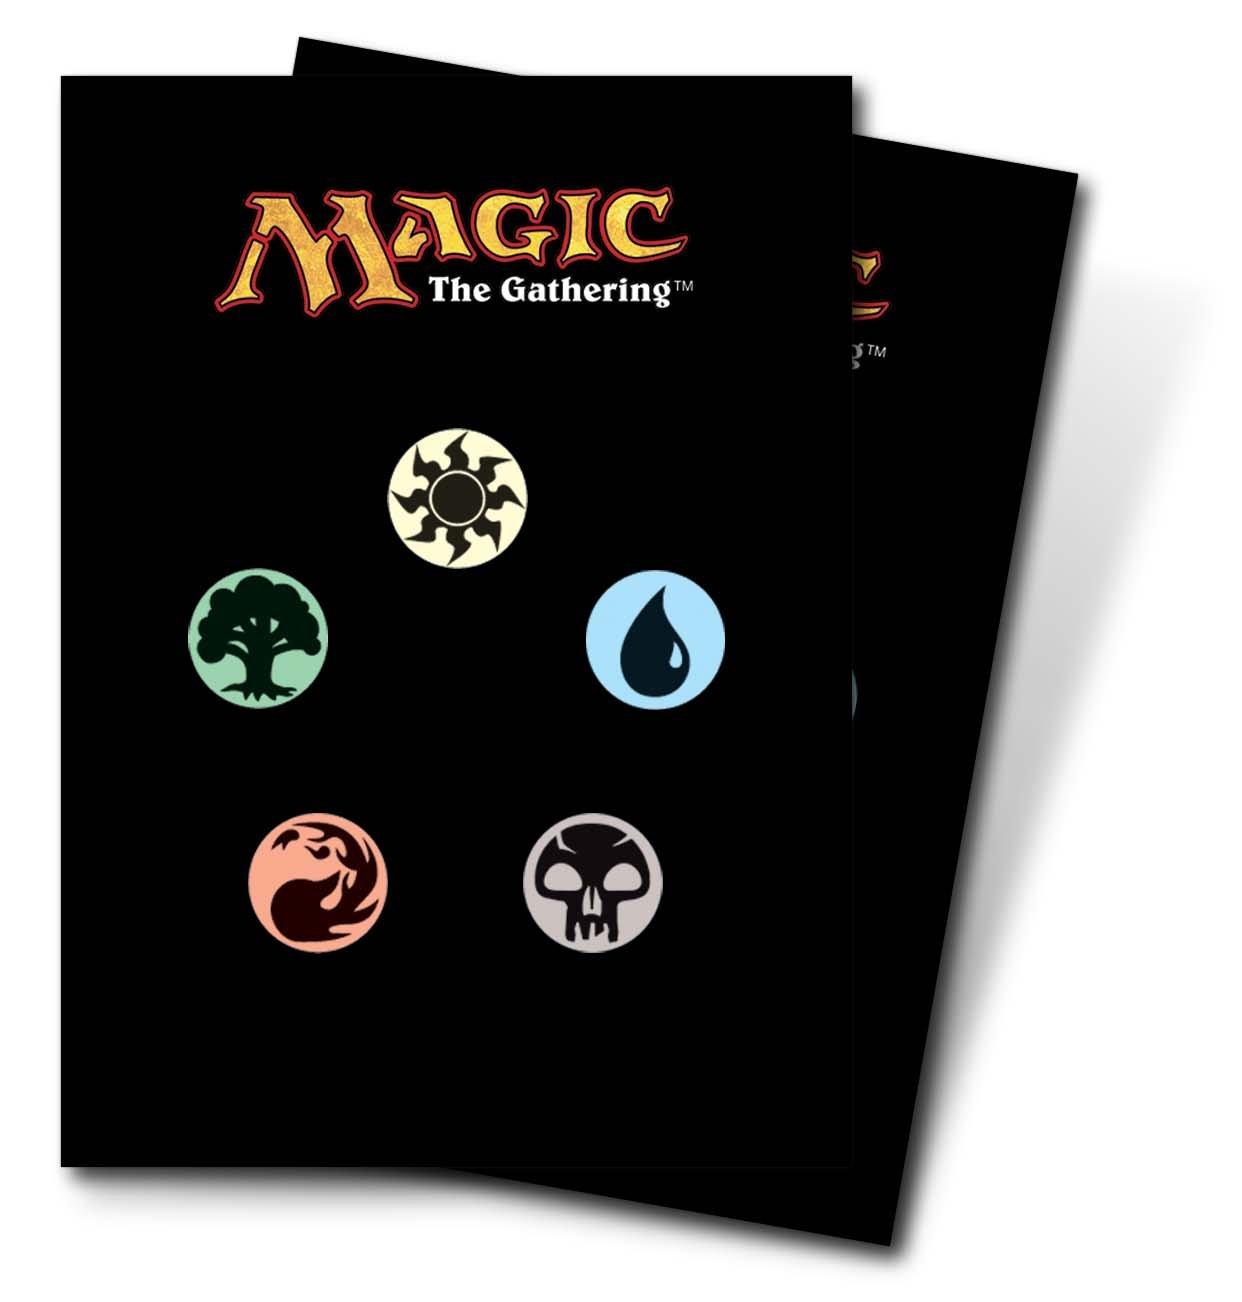 Amazon utra pro the magic the gathering mtg mana symbols amazon utra pro the magic the gathering mtg mana symbols back deck protectors 80 sleeves toys games biocorpaavc